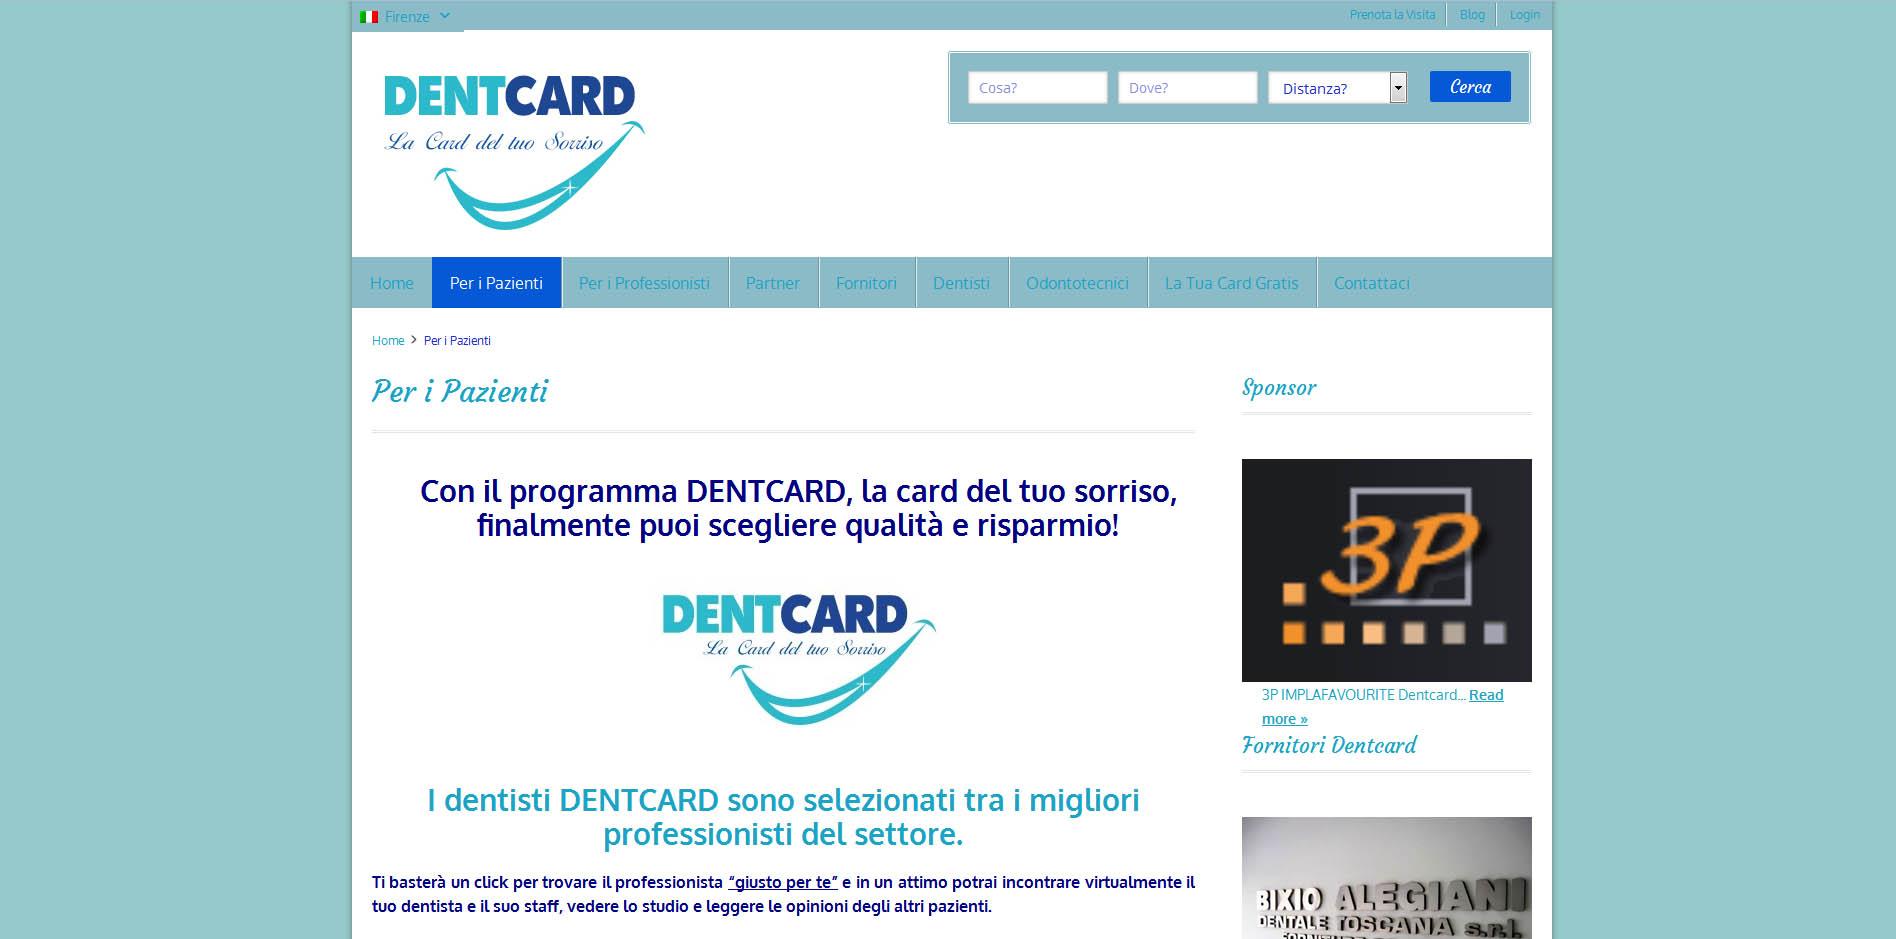 Dentcard